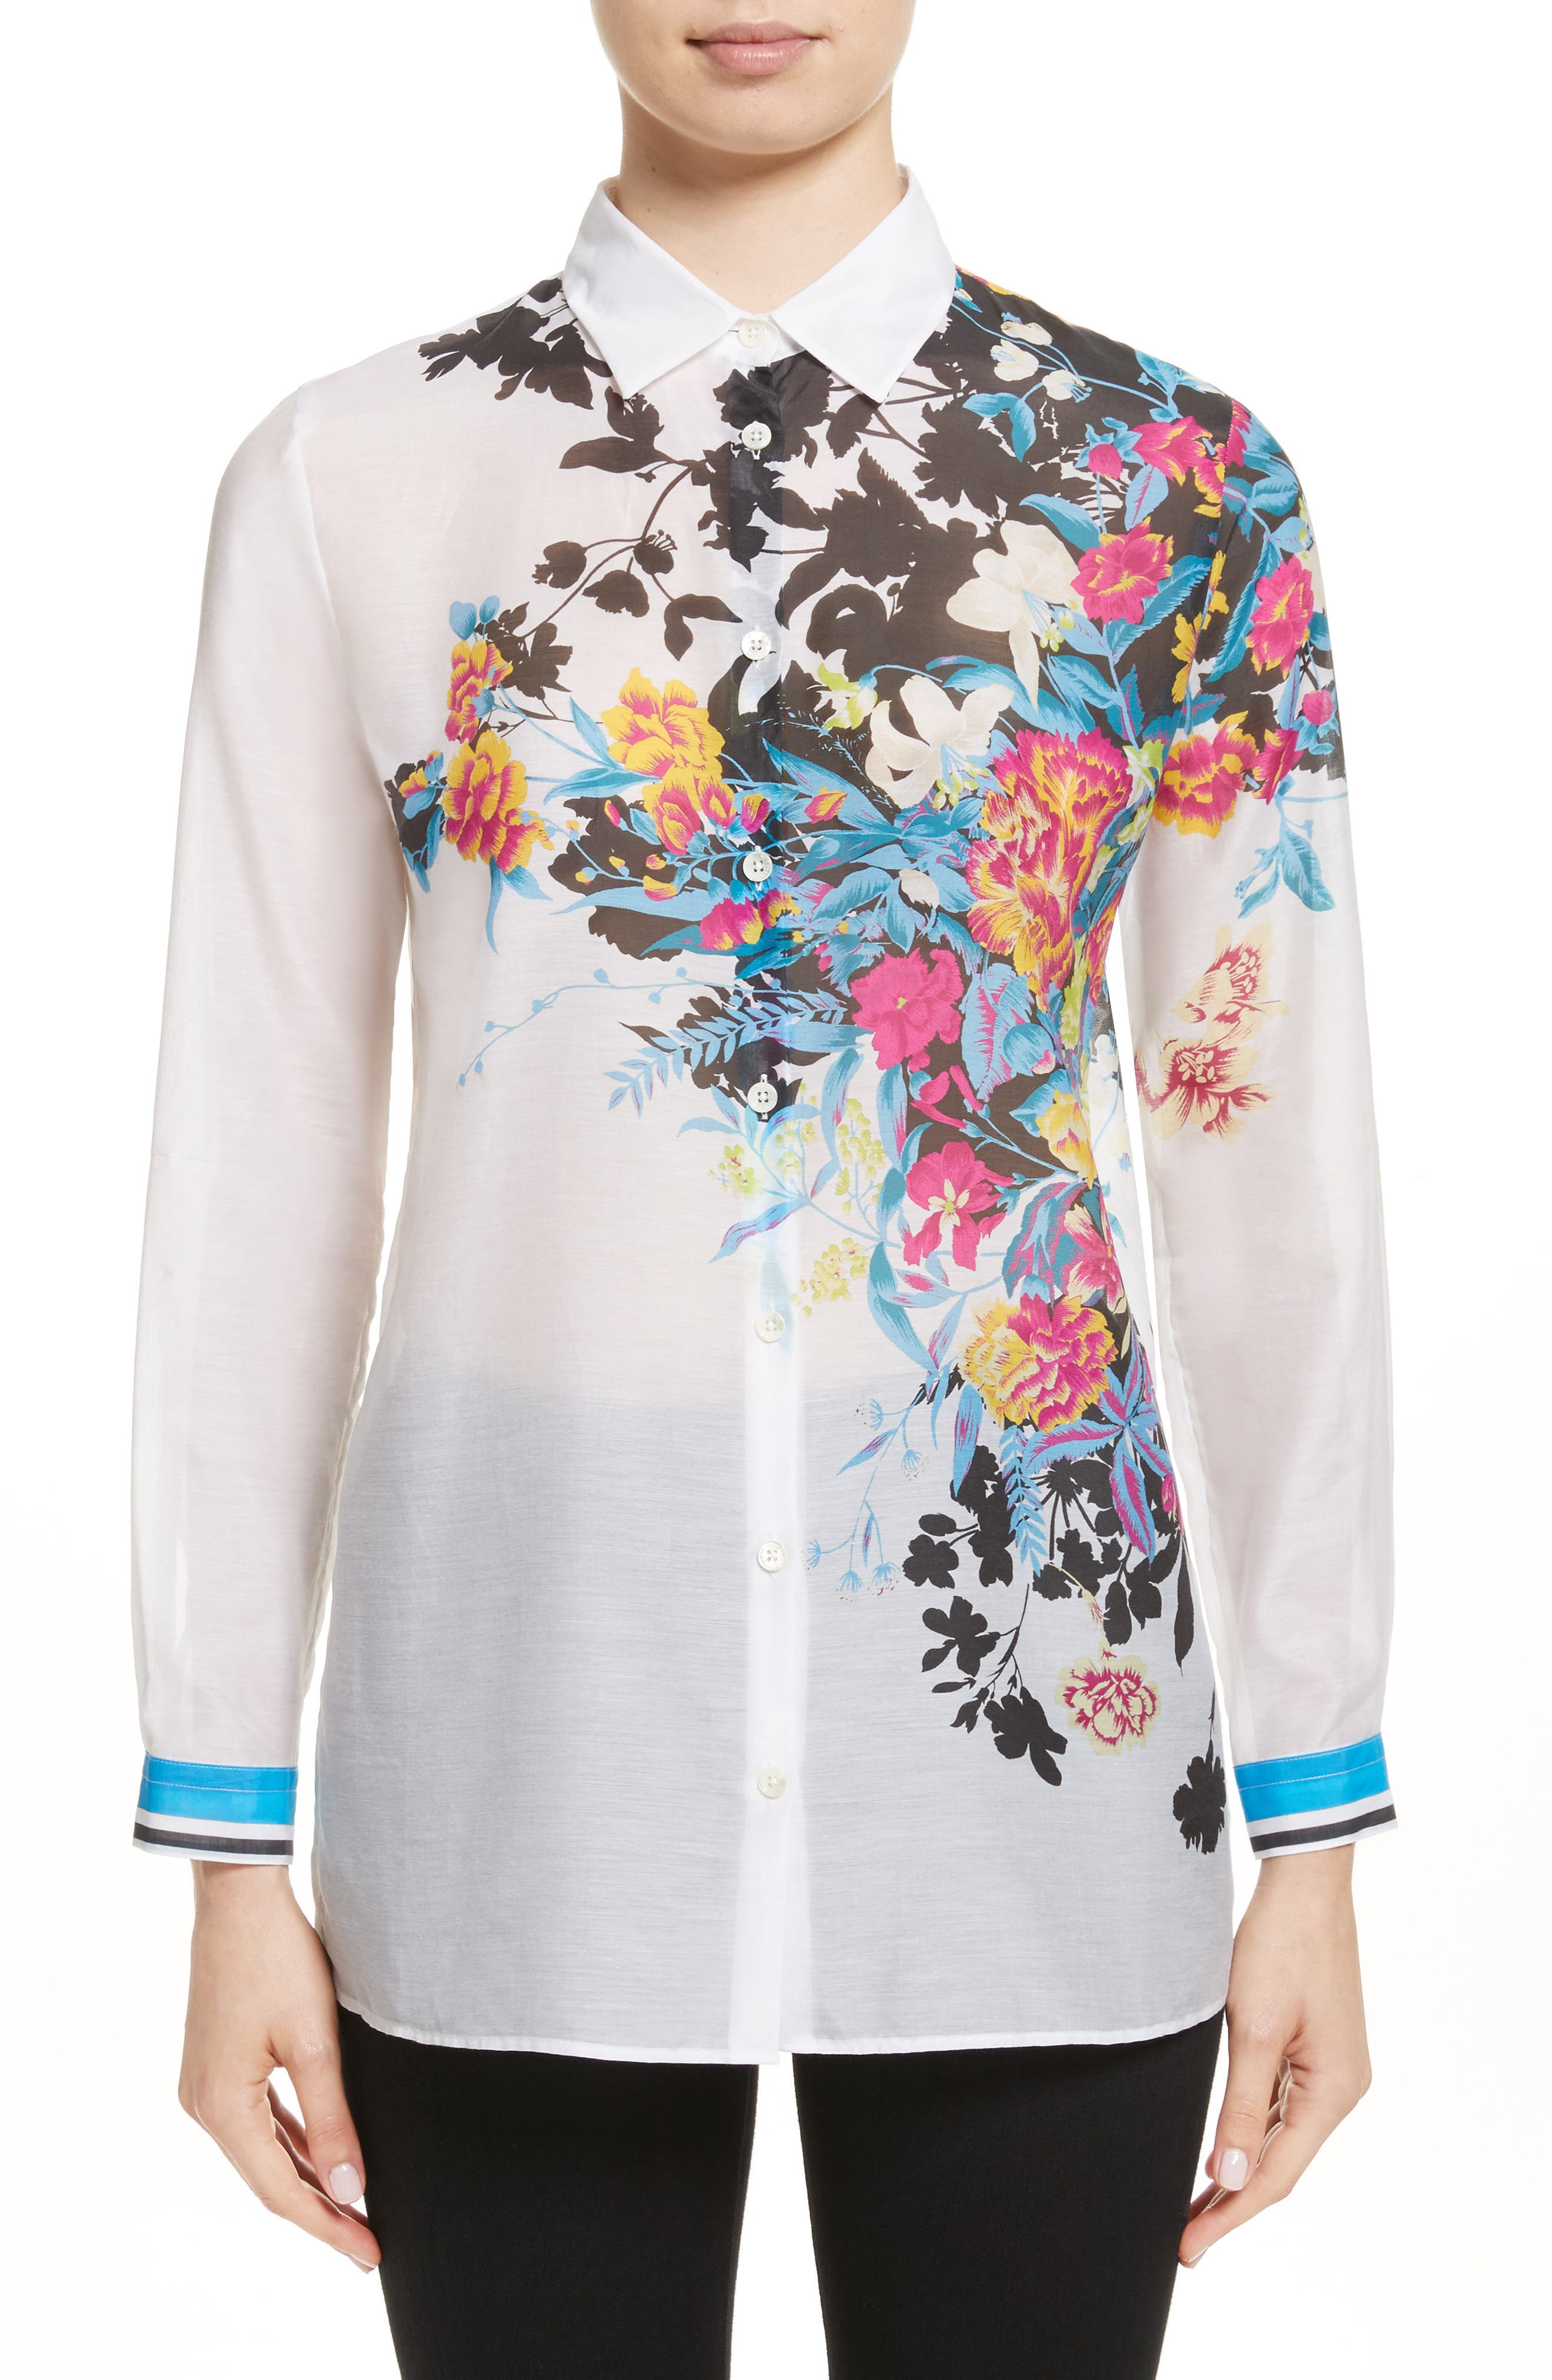 Etro Floral Print Cotton & Silk Blouse